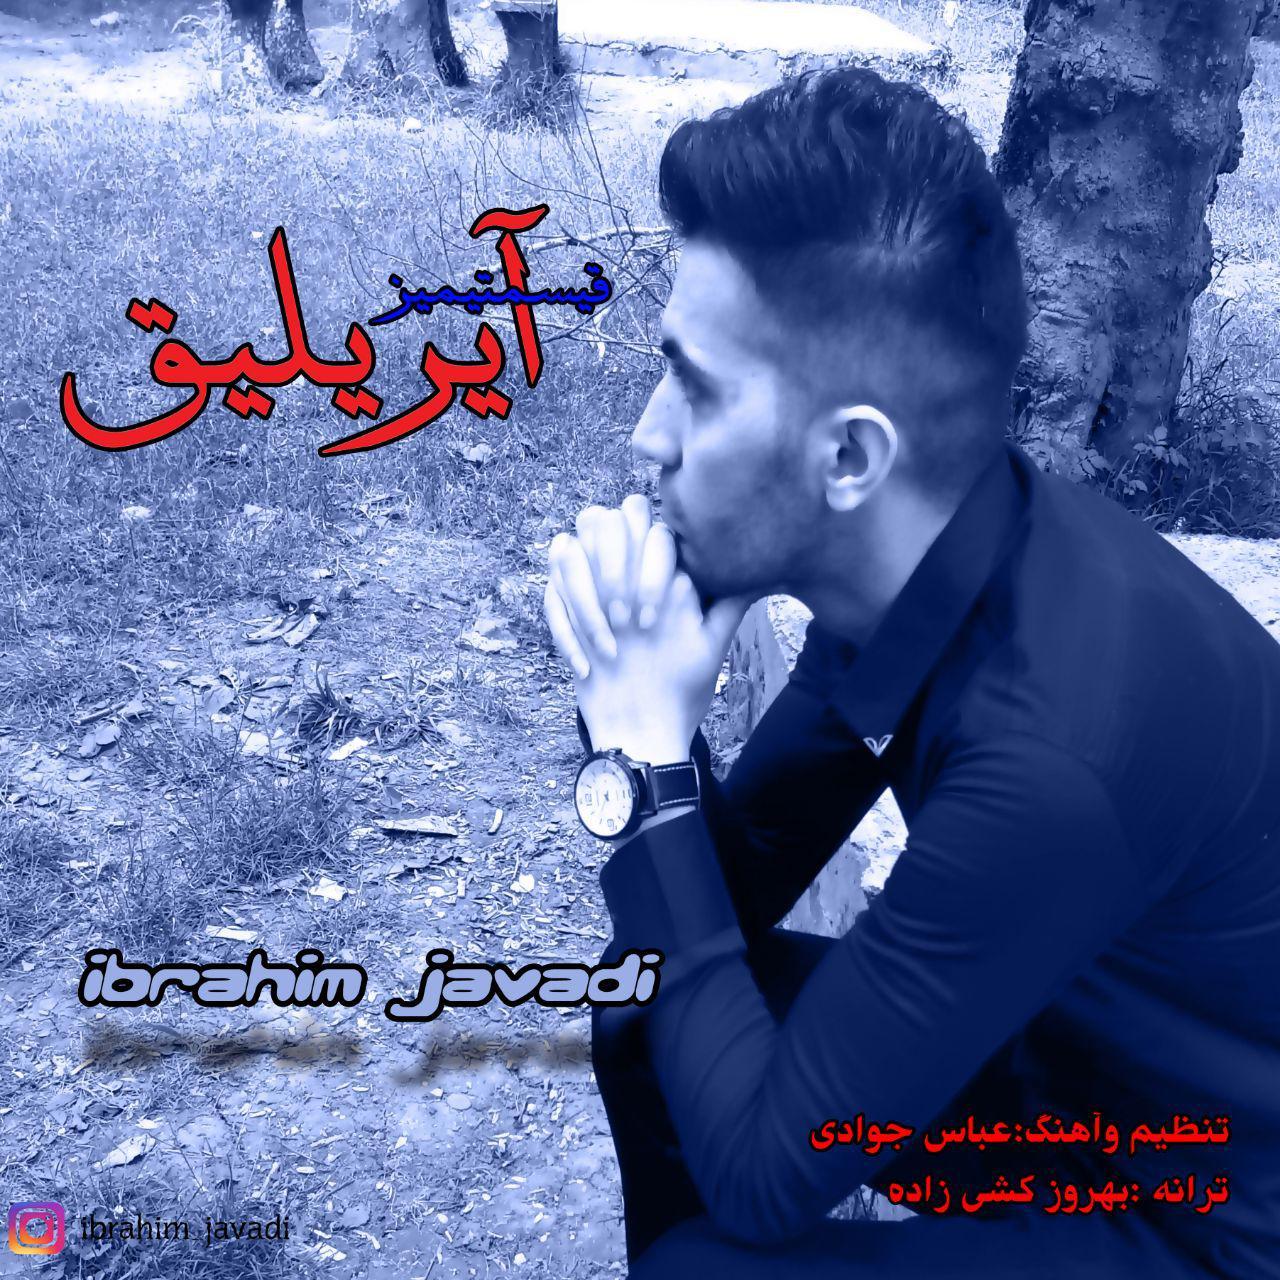 http://birtunes.ir/wp-content/uploads/2018/10/Ibrahim-Javadi-Ghismatimiz-Ayriligh.jpg